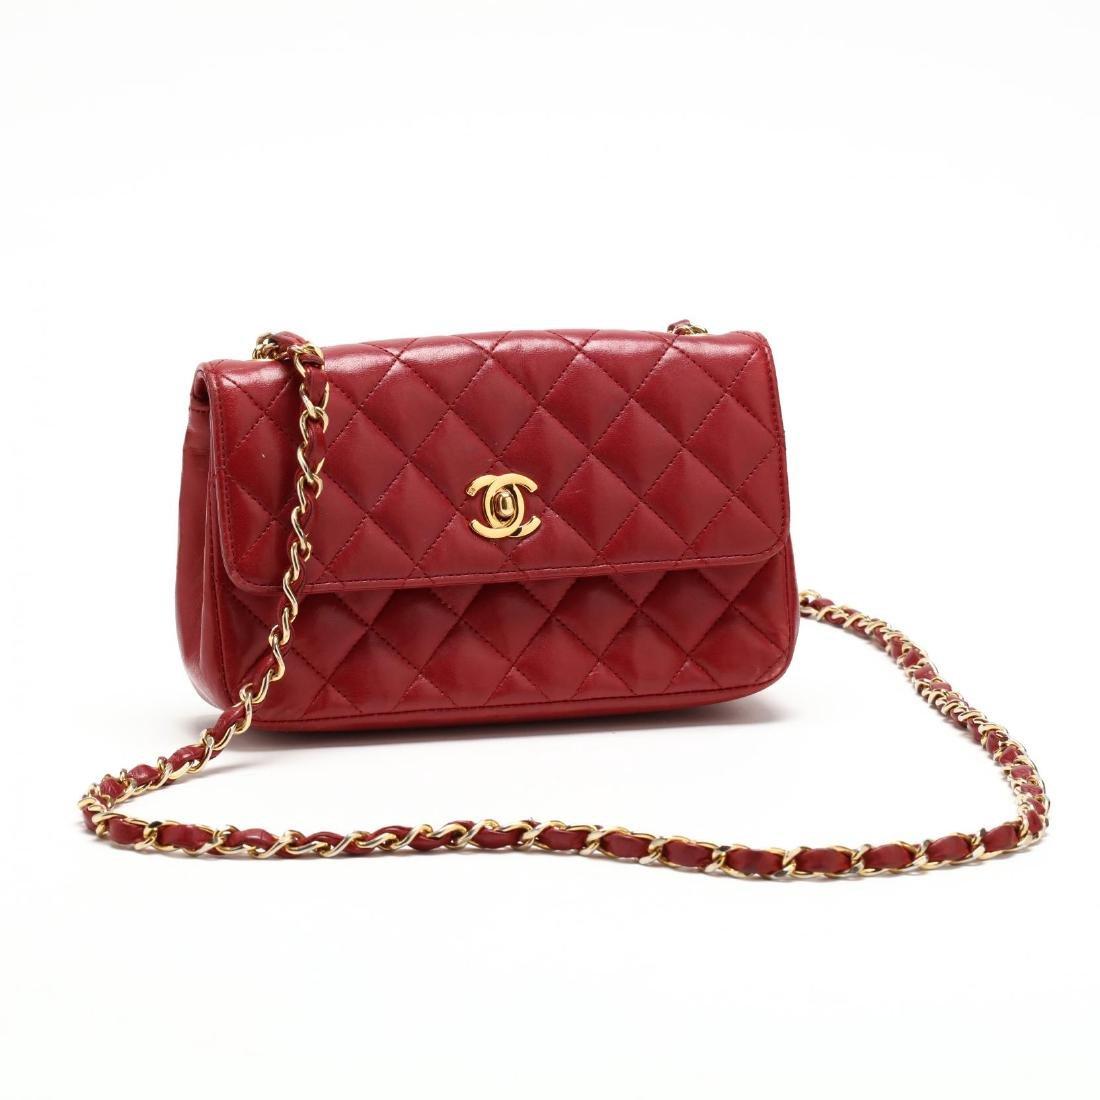 Small Rectangular Flap Shoulder Bag, Chanel